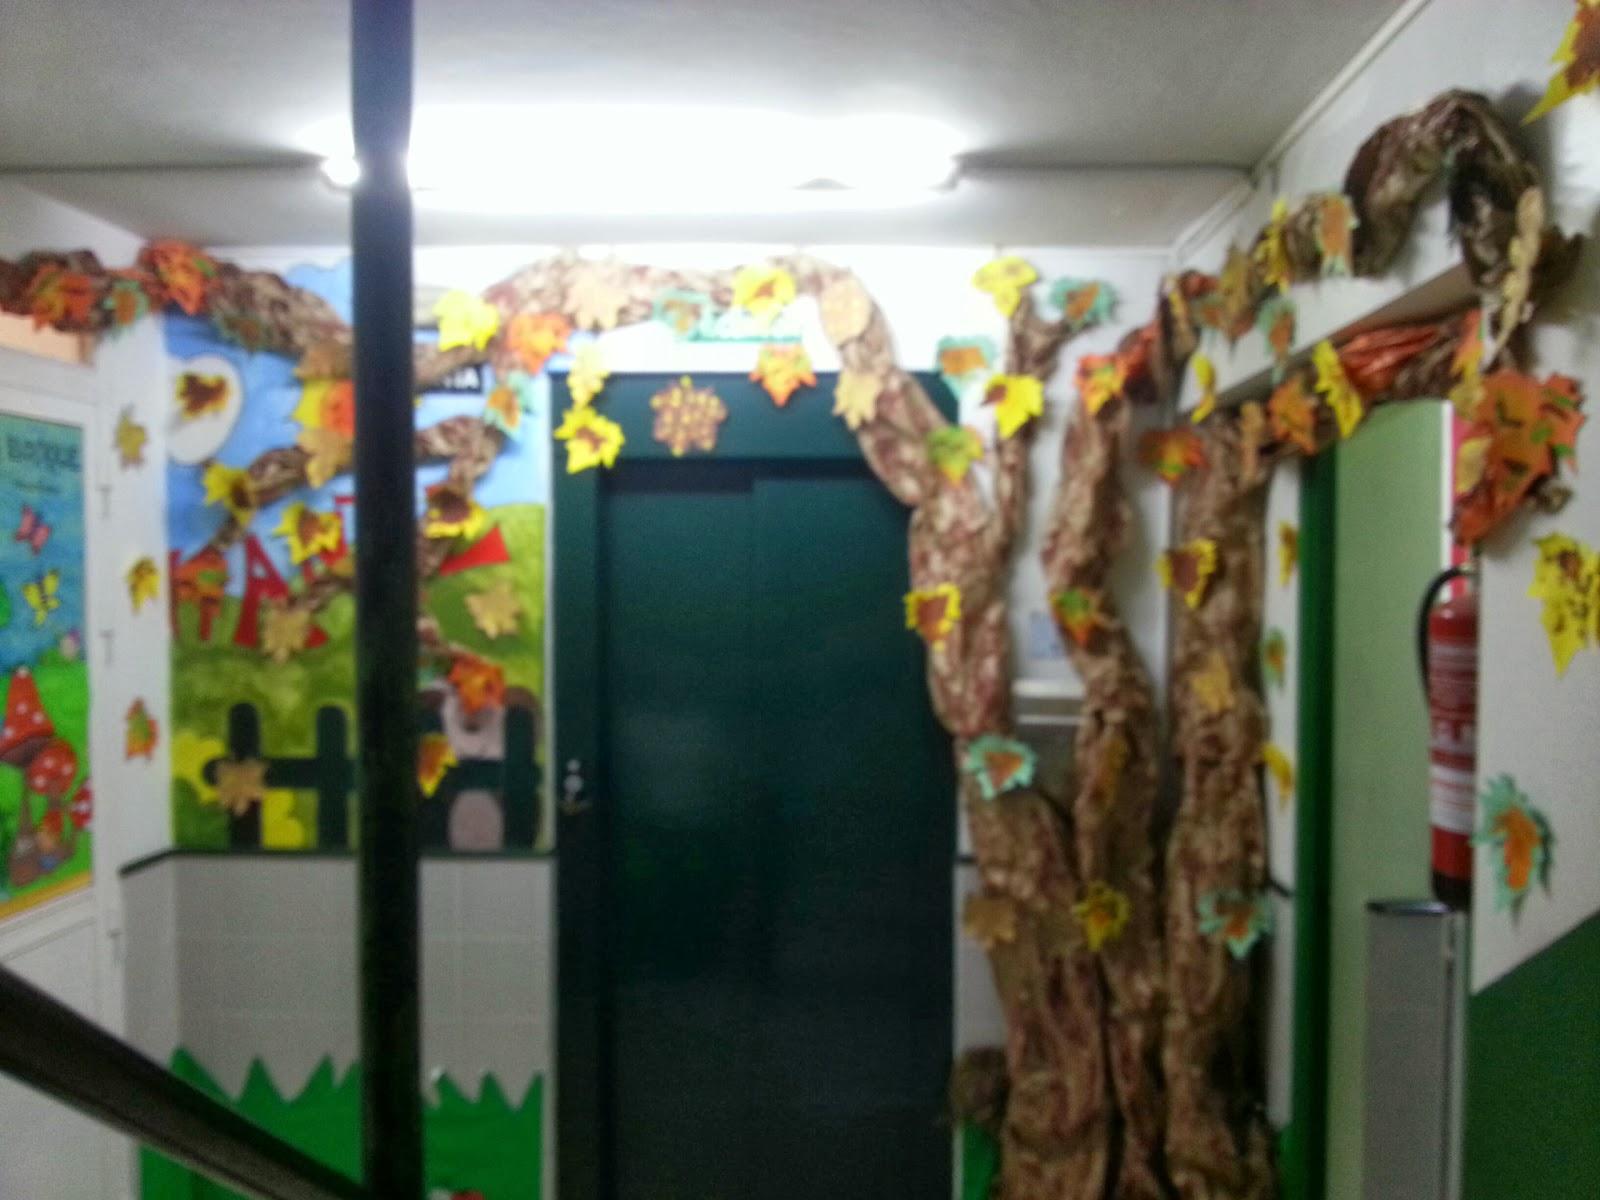 Decoracion oto o aula infantil for Decoracion escuela